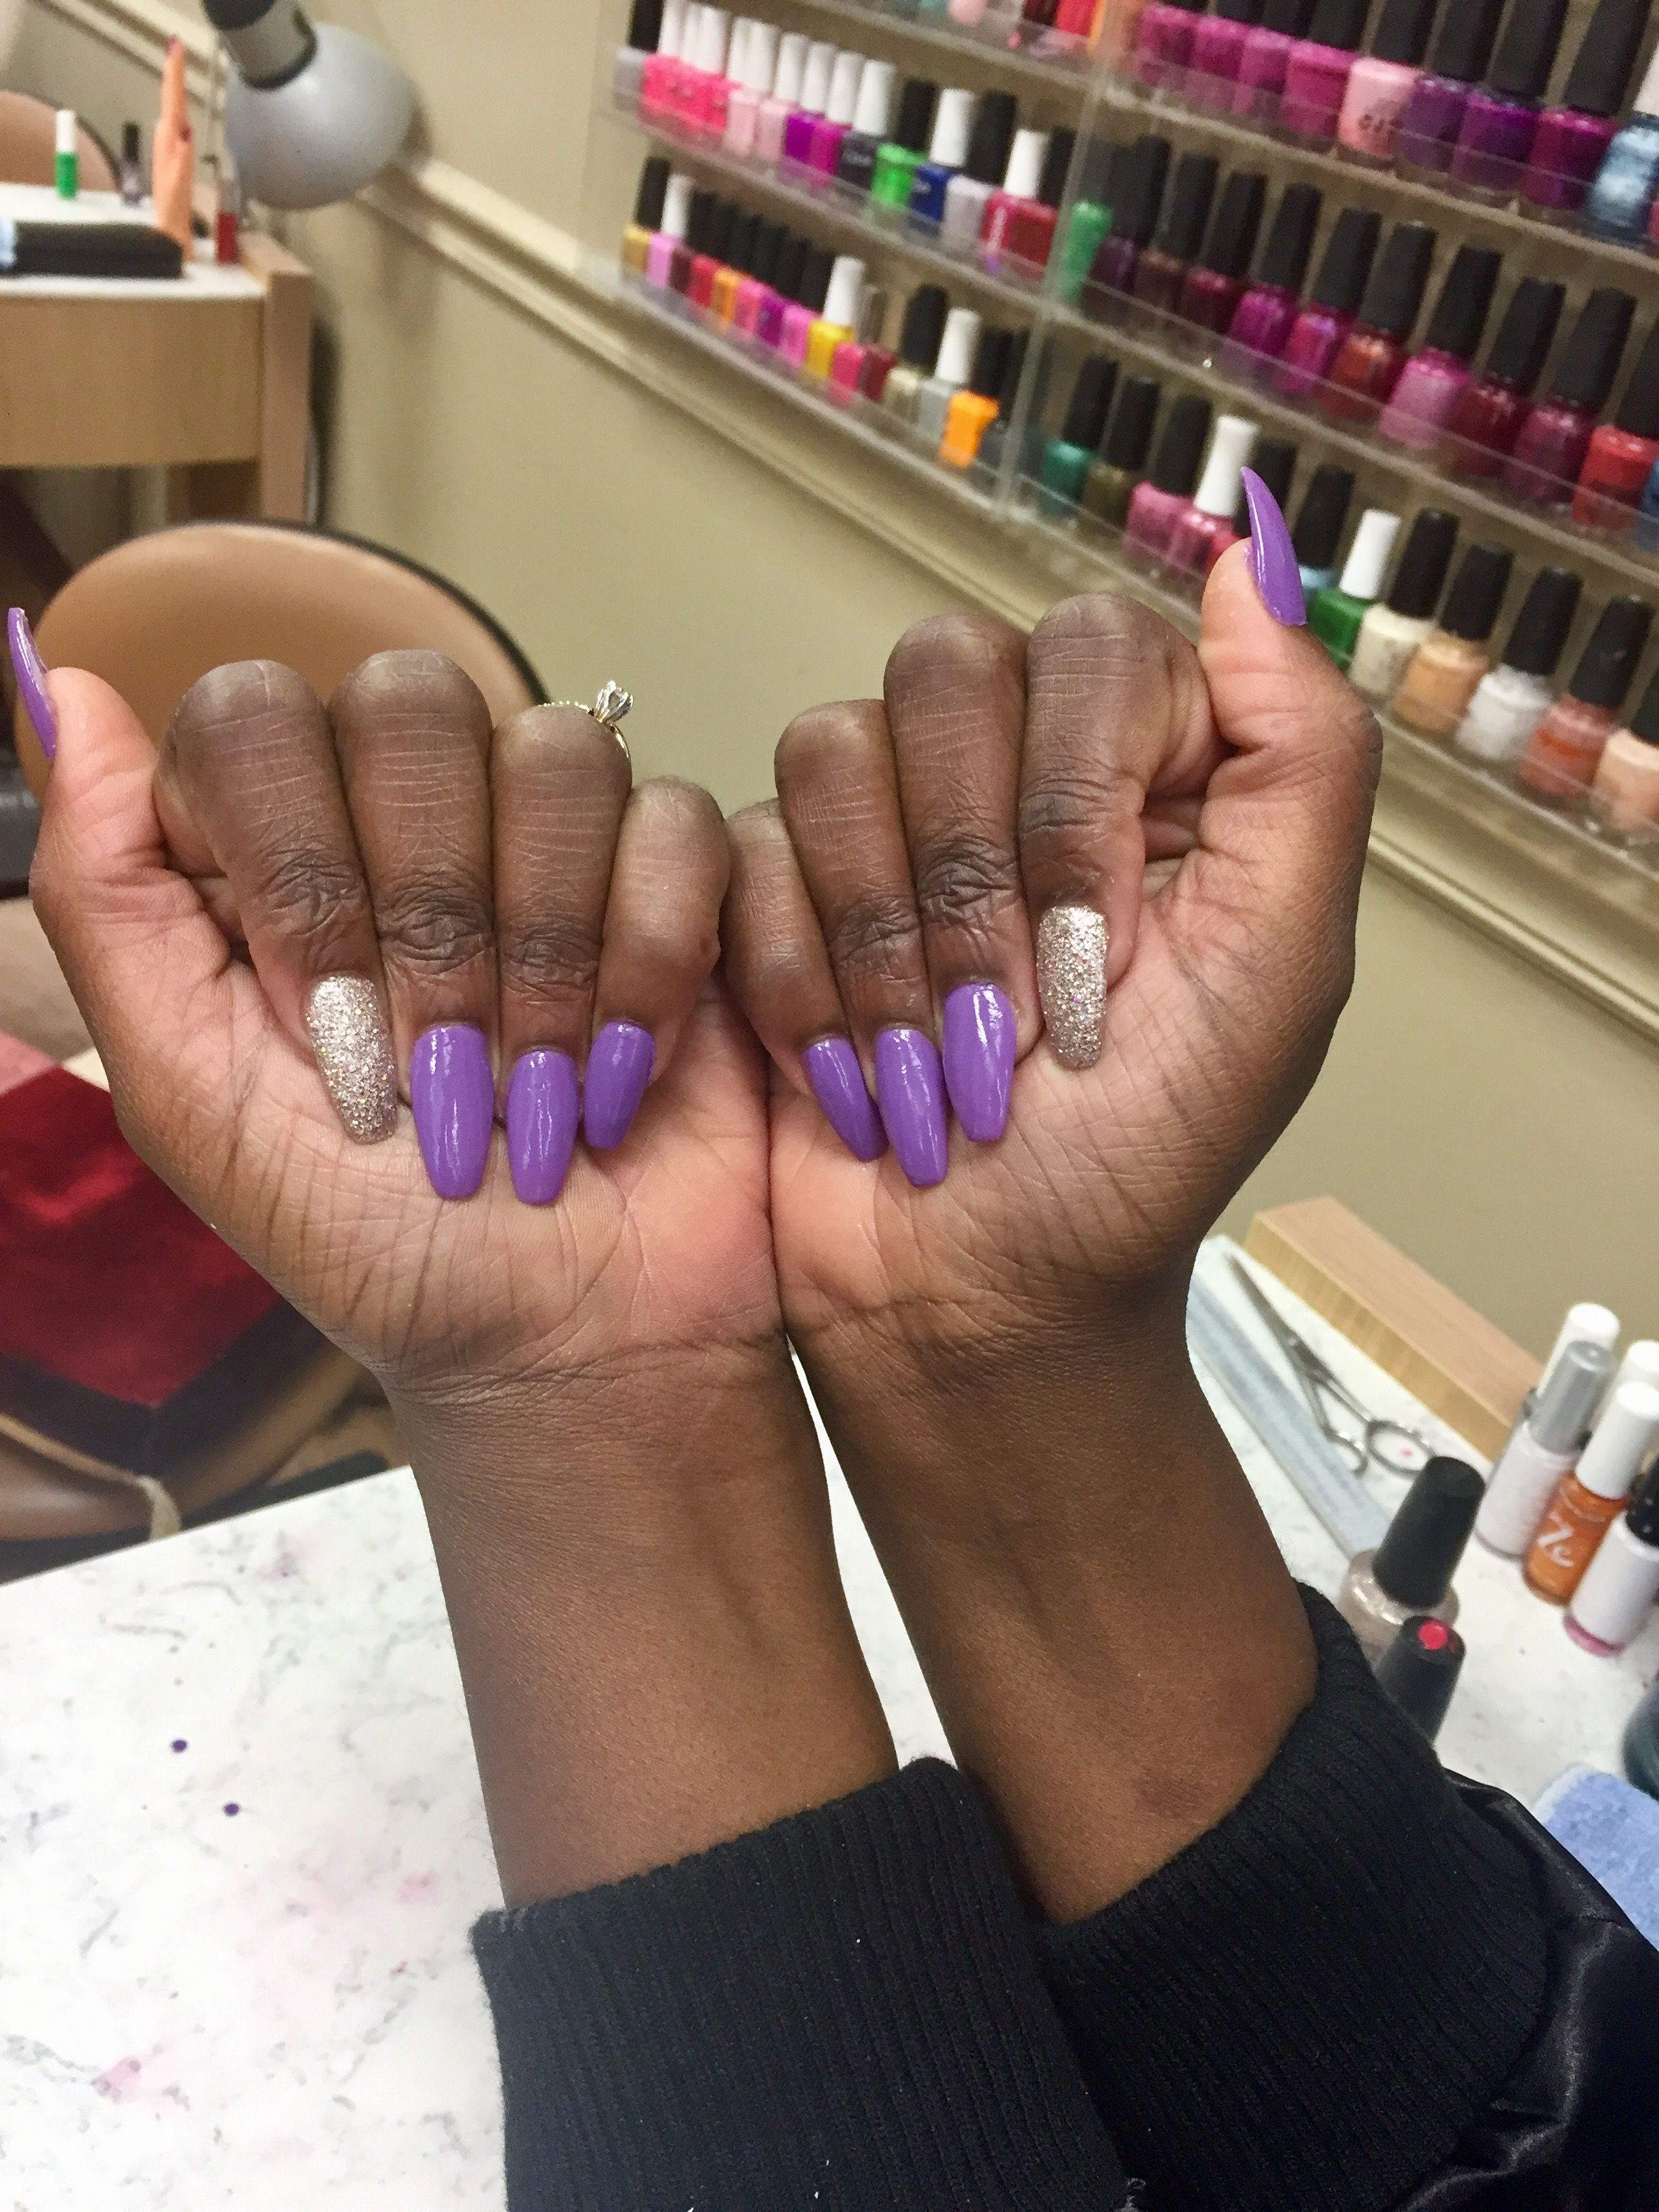 Purple Coffin Nails Sparkle Nails Medium Length Nails Acrylic Nails Sparkle Nails Acrylic Nails Coffin Short Acrylic Nails Yellow